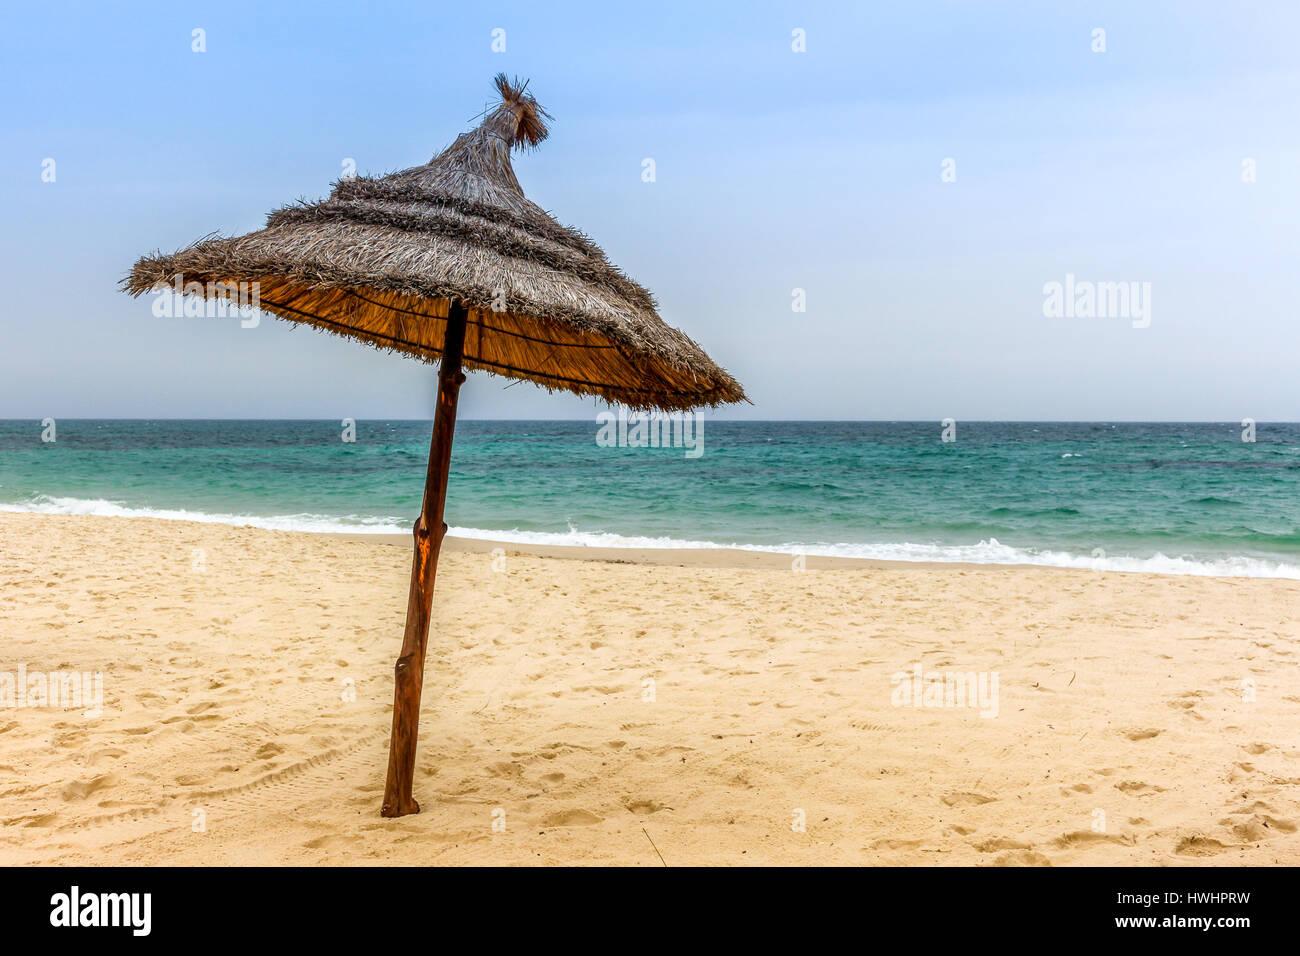 Sonnenschirm Tunesien - Stock Image